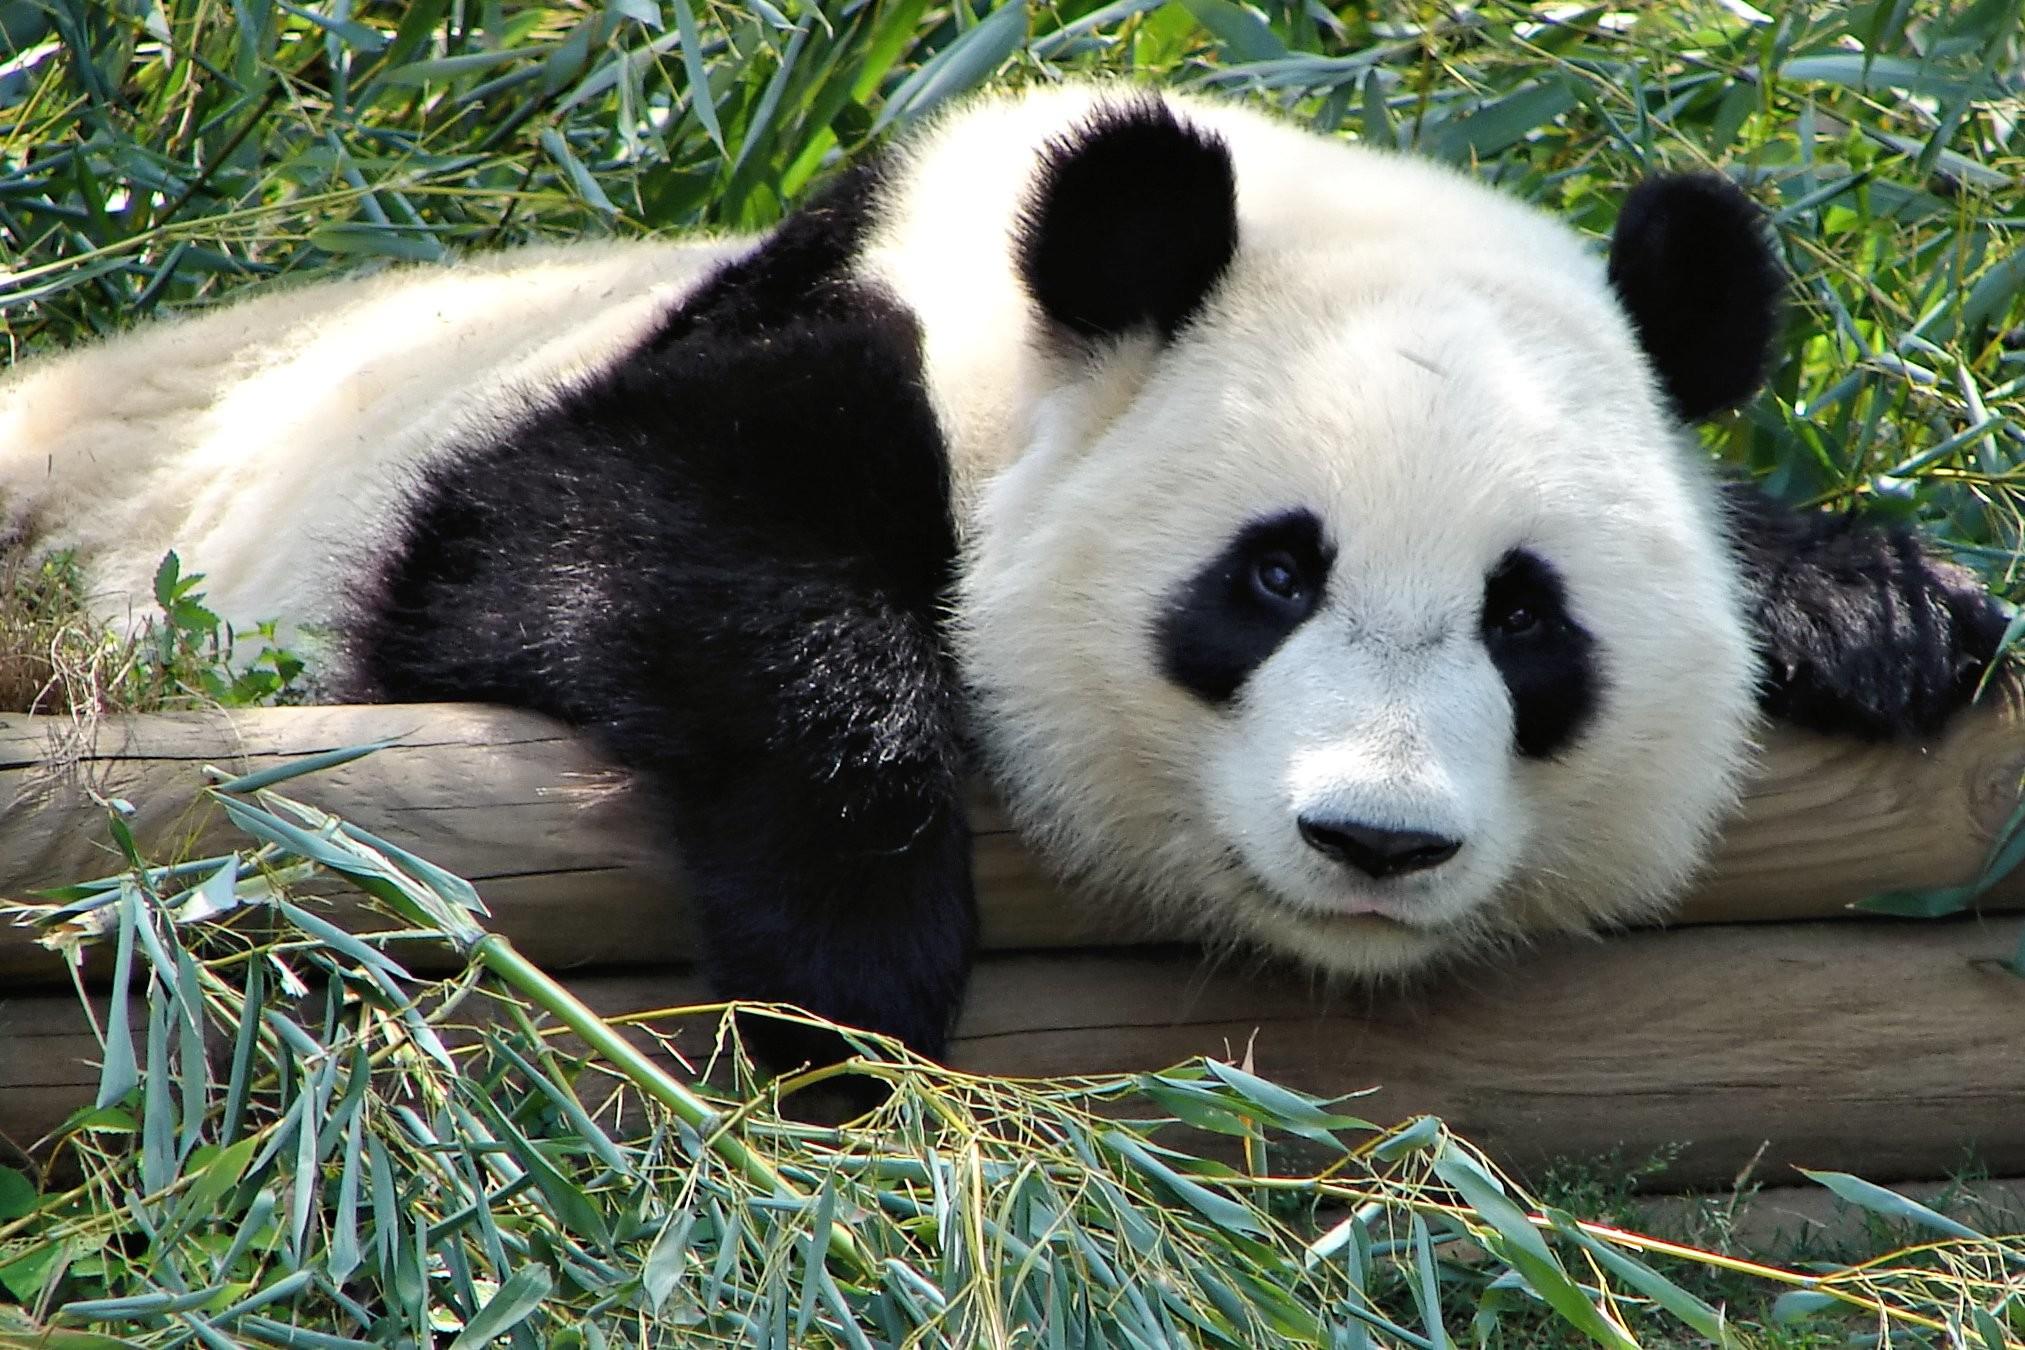 Pandas wallpapers for desktop